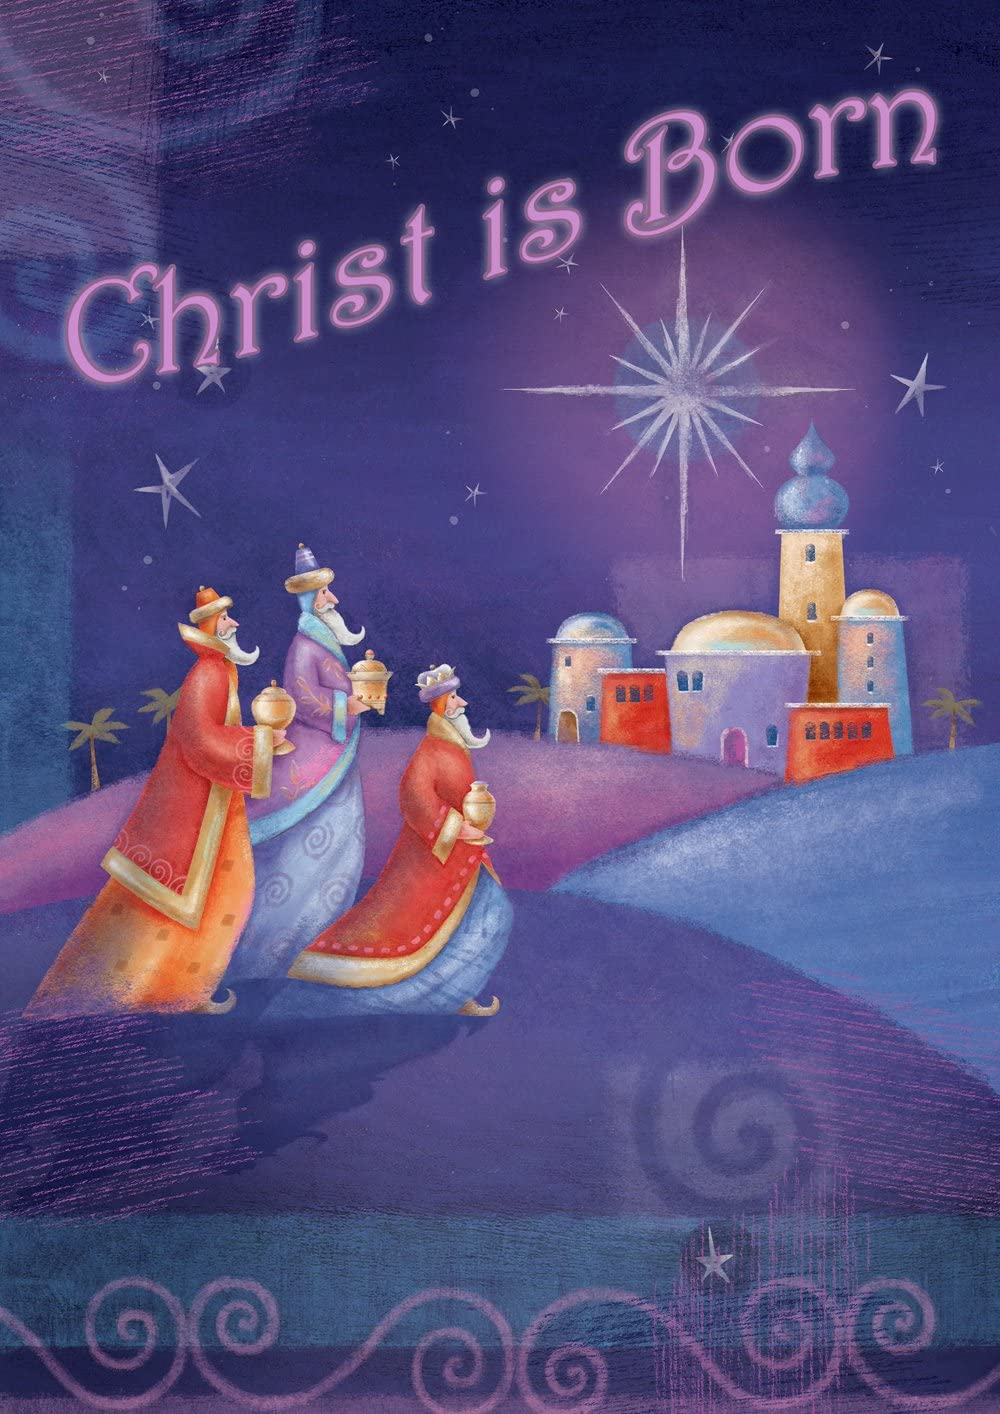 Toland Home Garden Christ is Born 12.5 x 18 Inch Decorative Winter Christmas Nativity Religious Faith Garden Flag